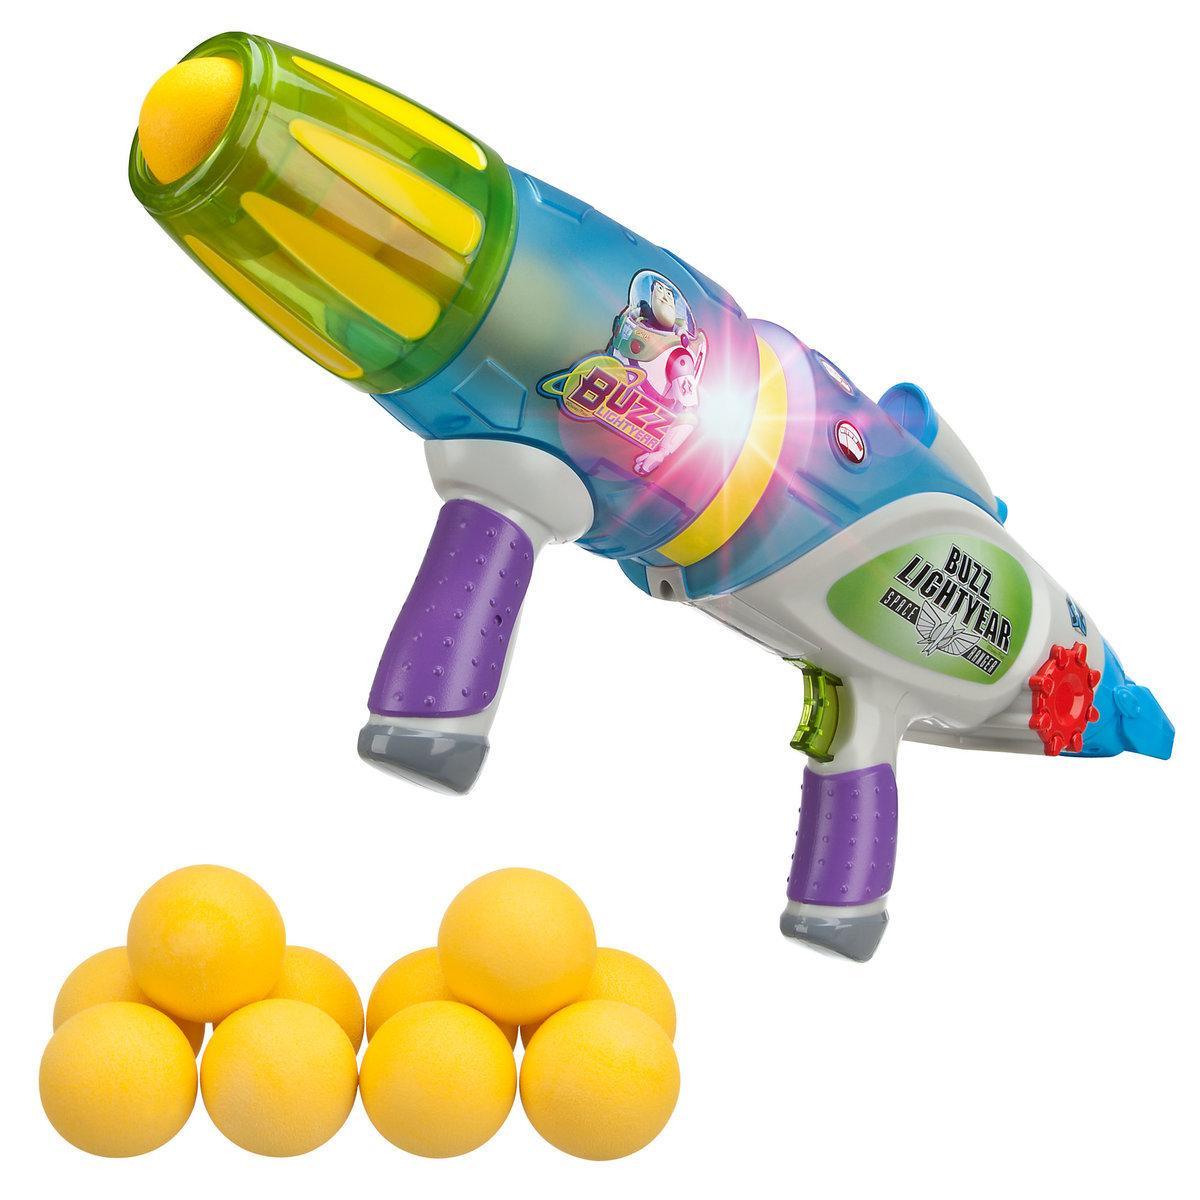 Бластер звук, свет, шарики светятся в темноте Buzz Lightyear Glow-in-the-Dark Blaster Disney из США